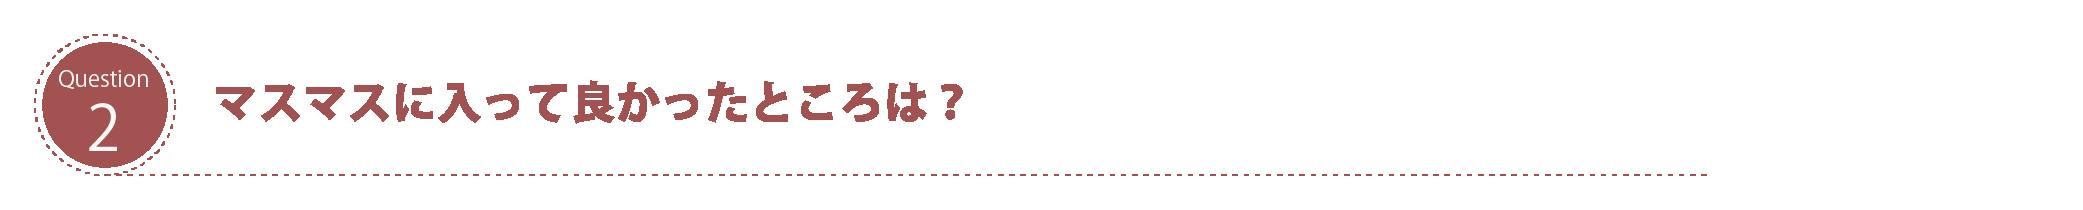 question -02